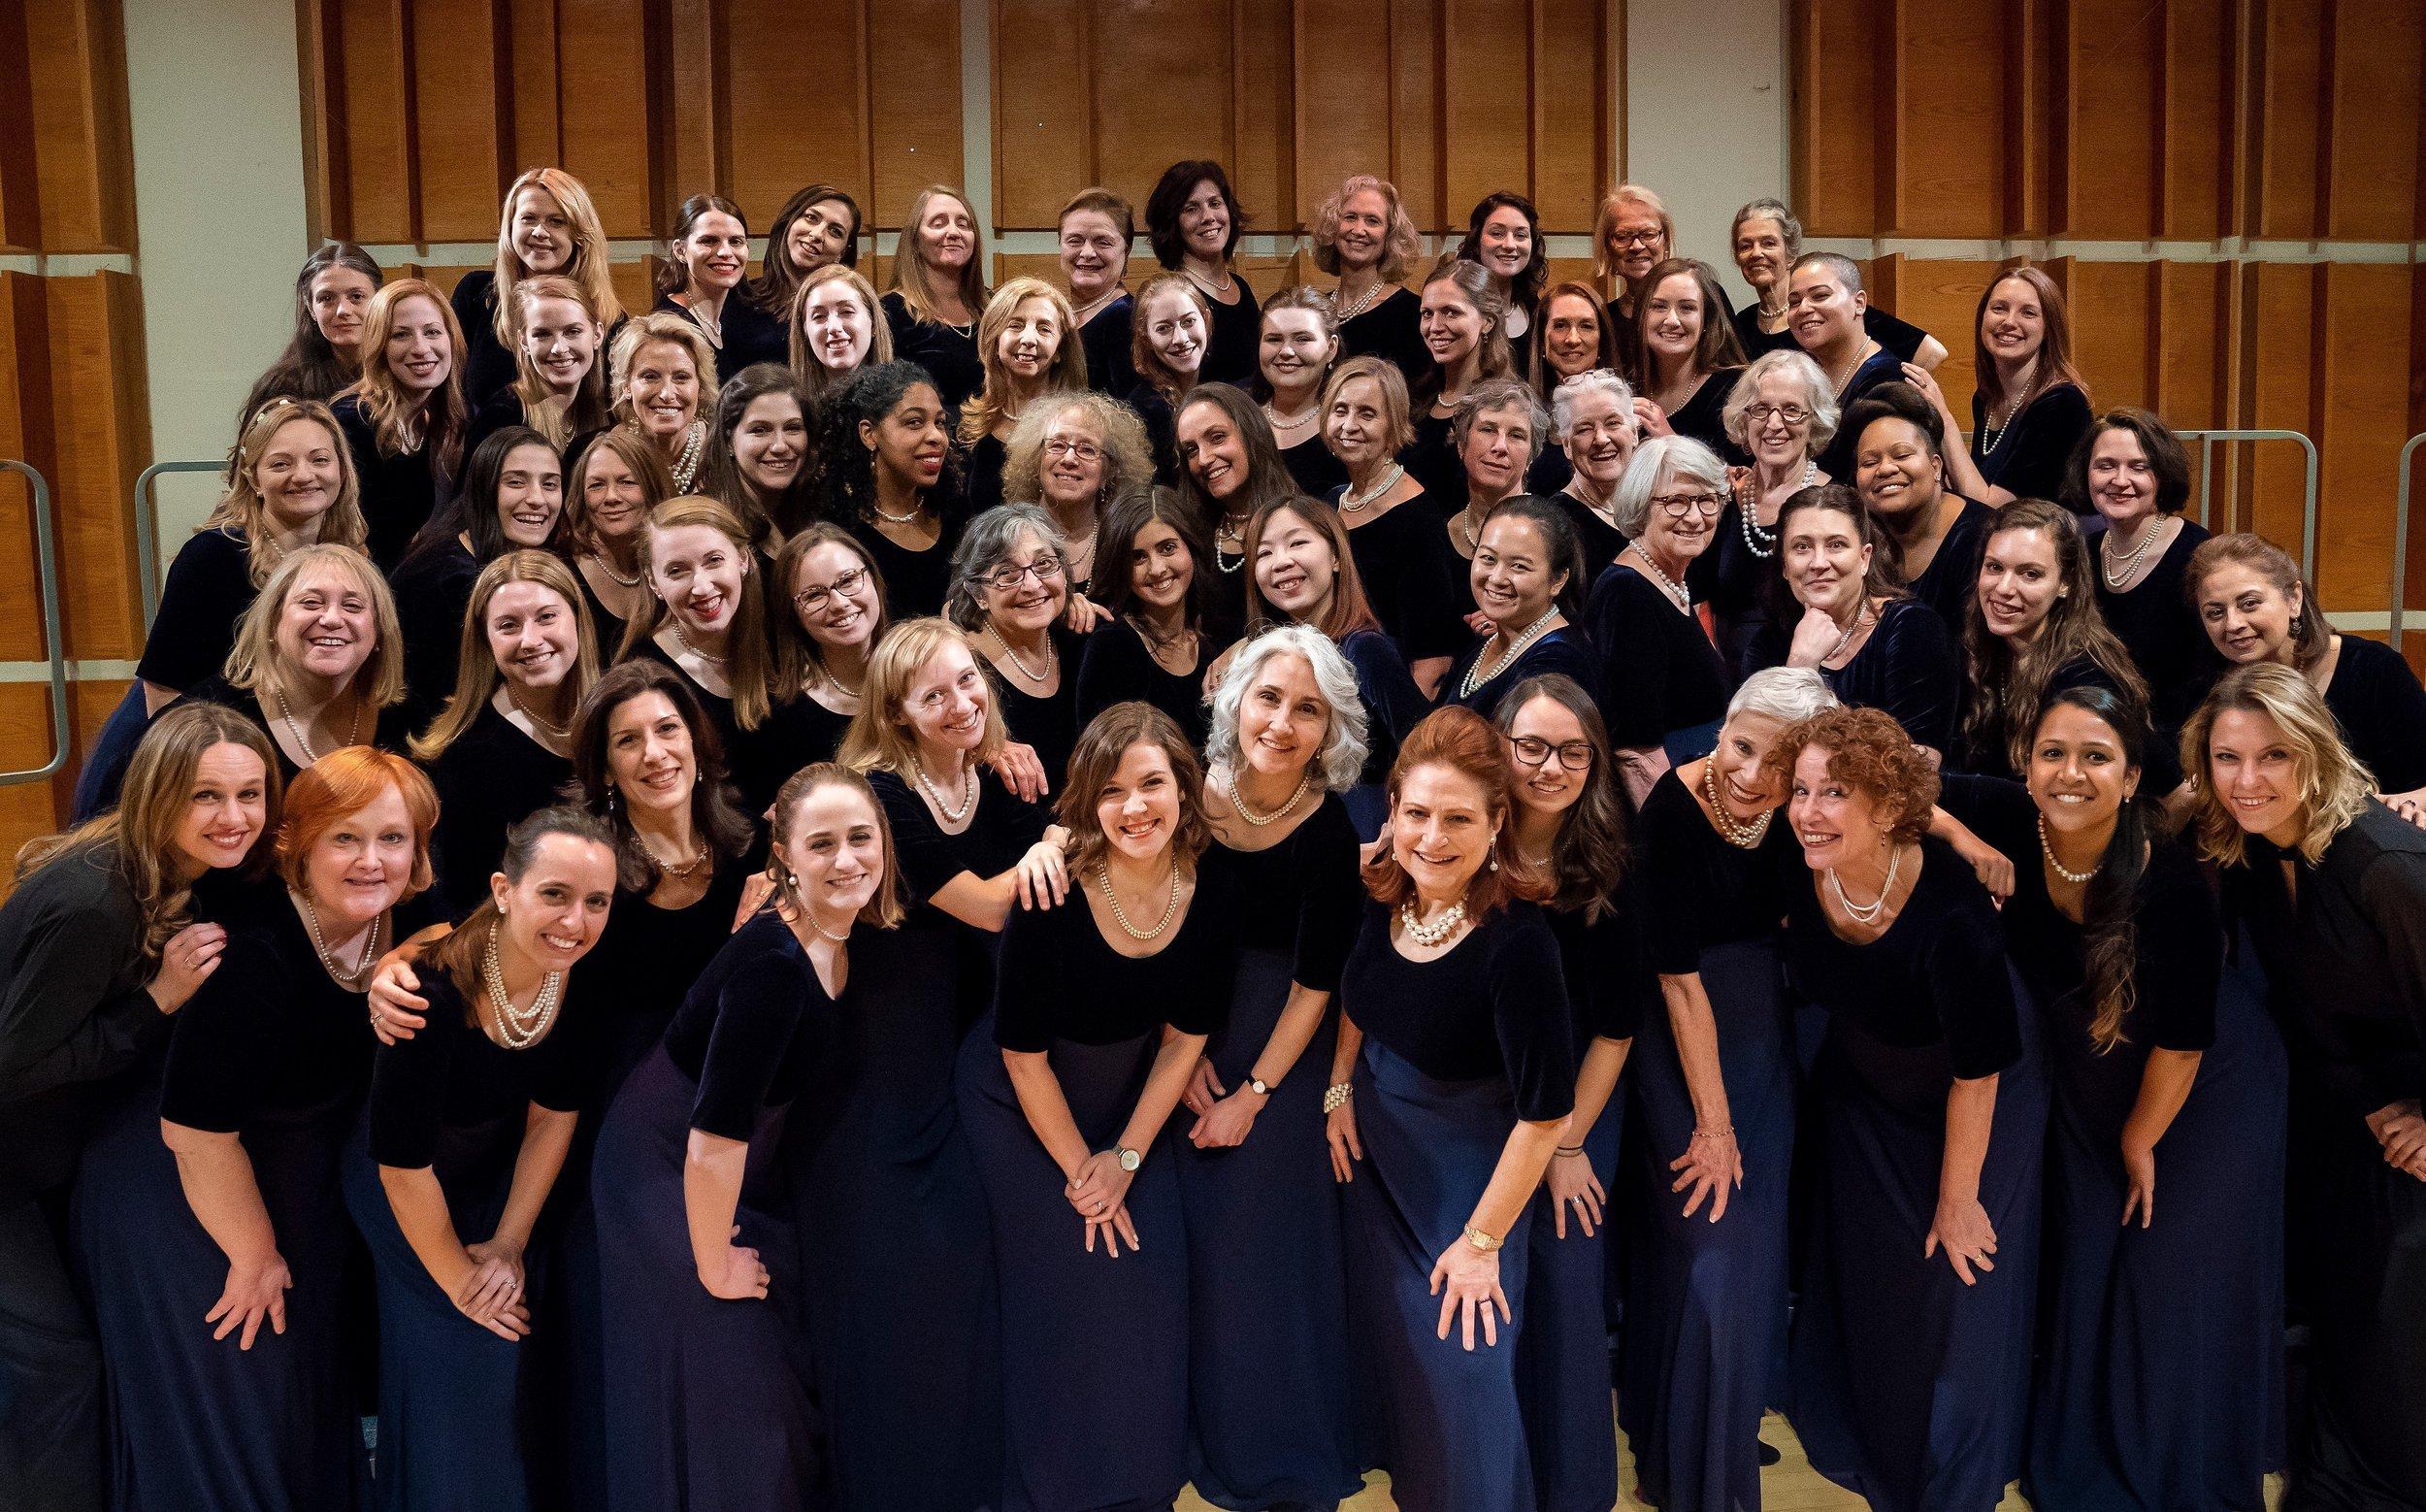 SoHarmonium Women's Choir